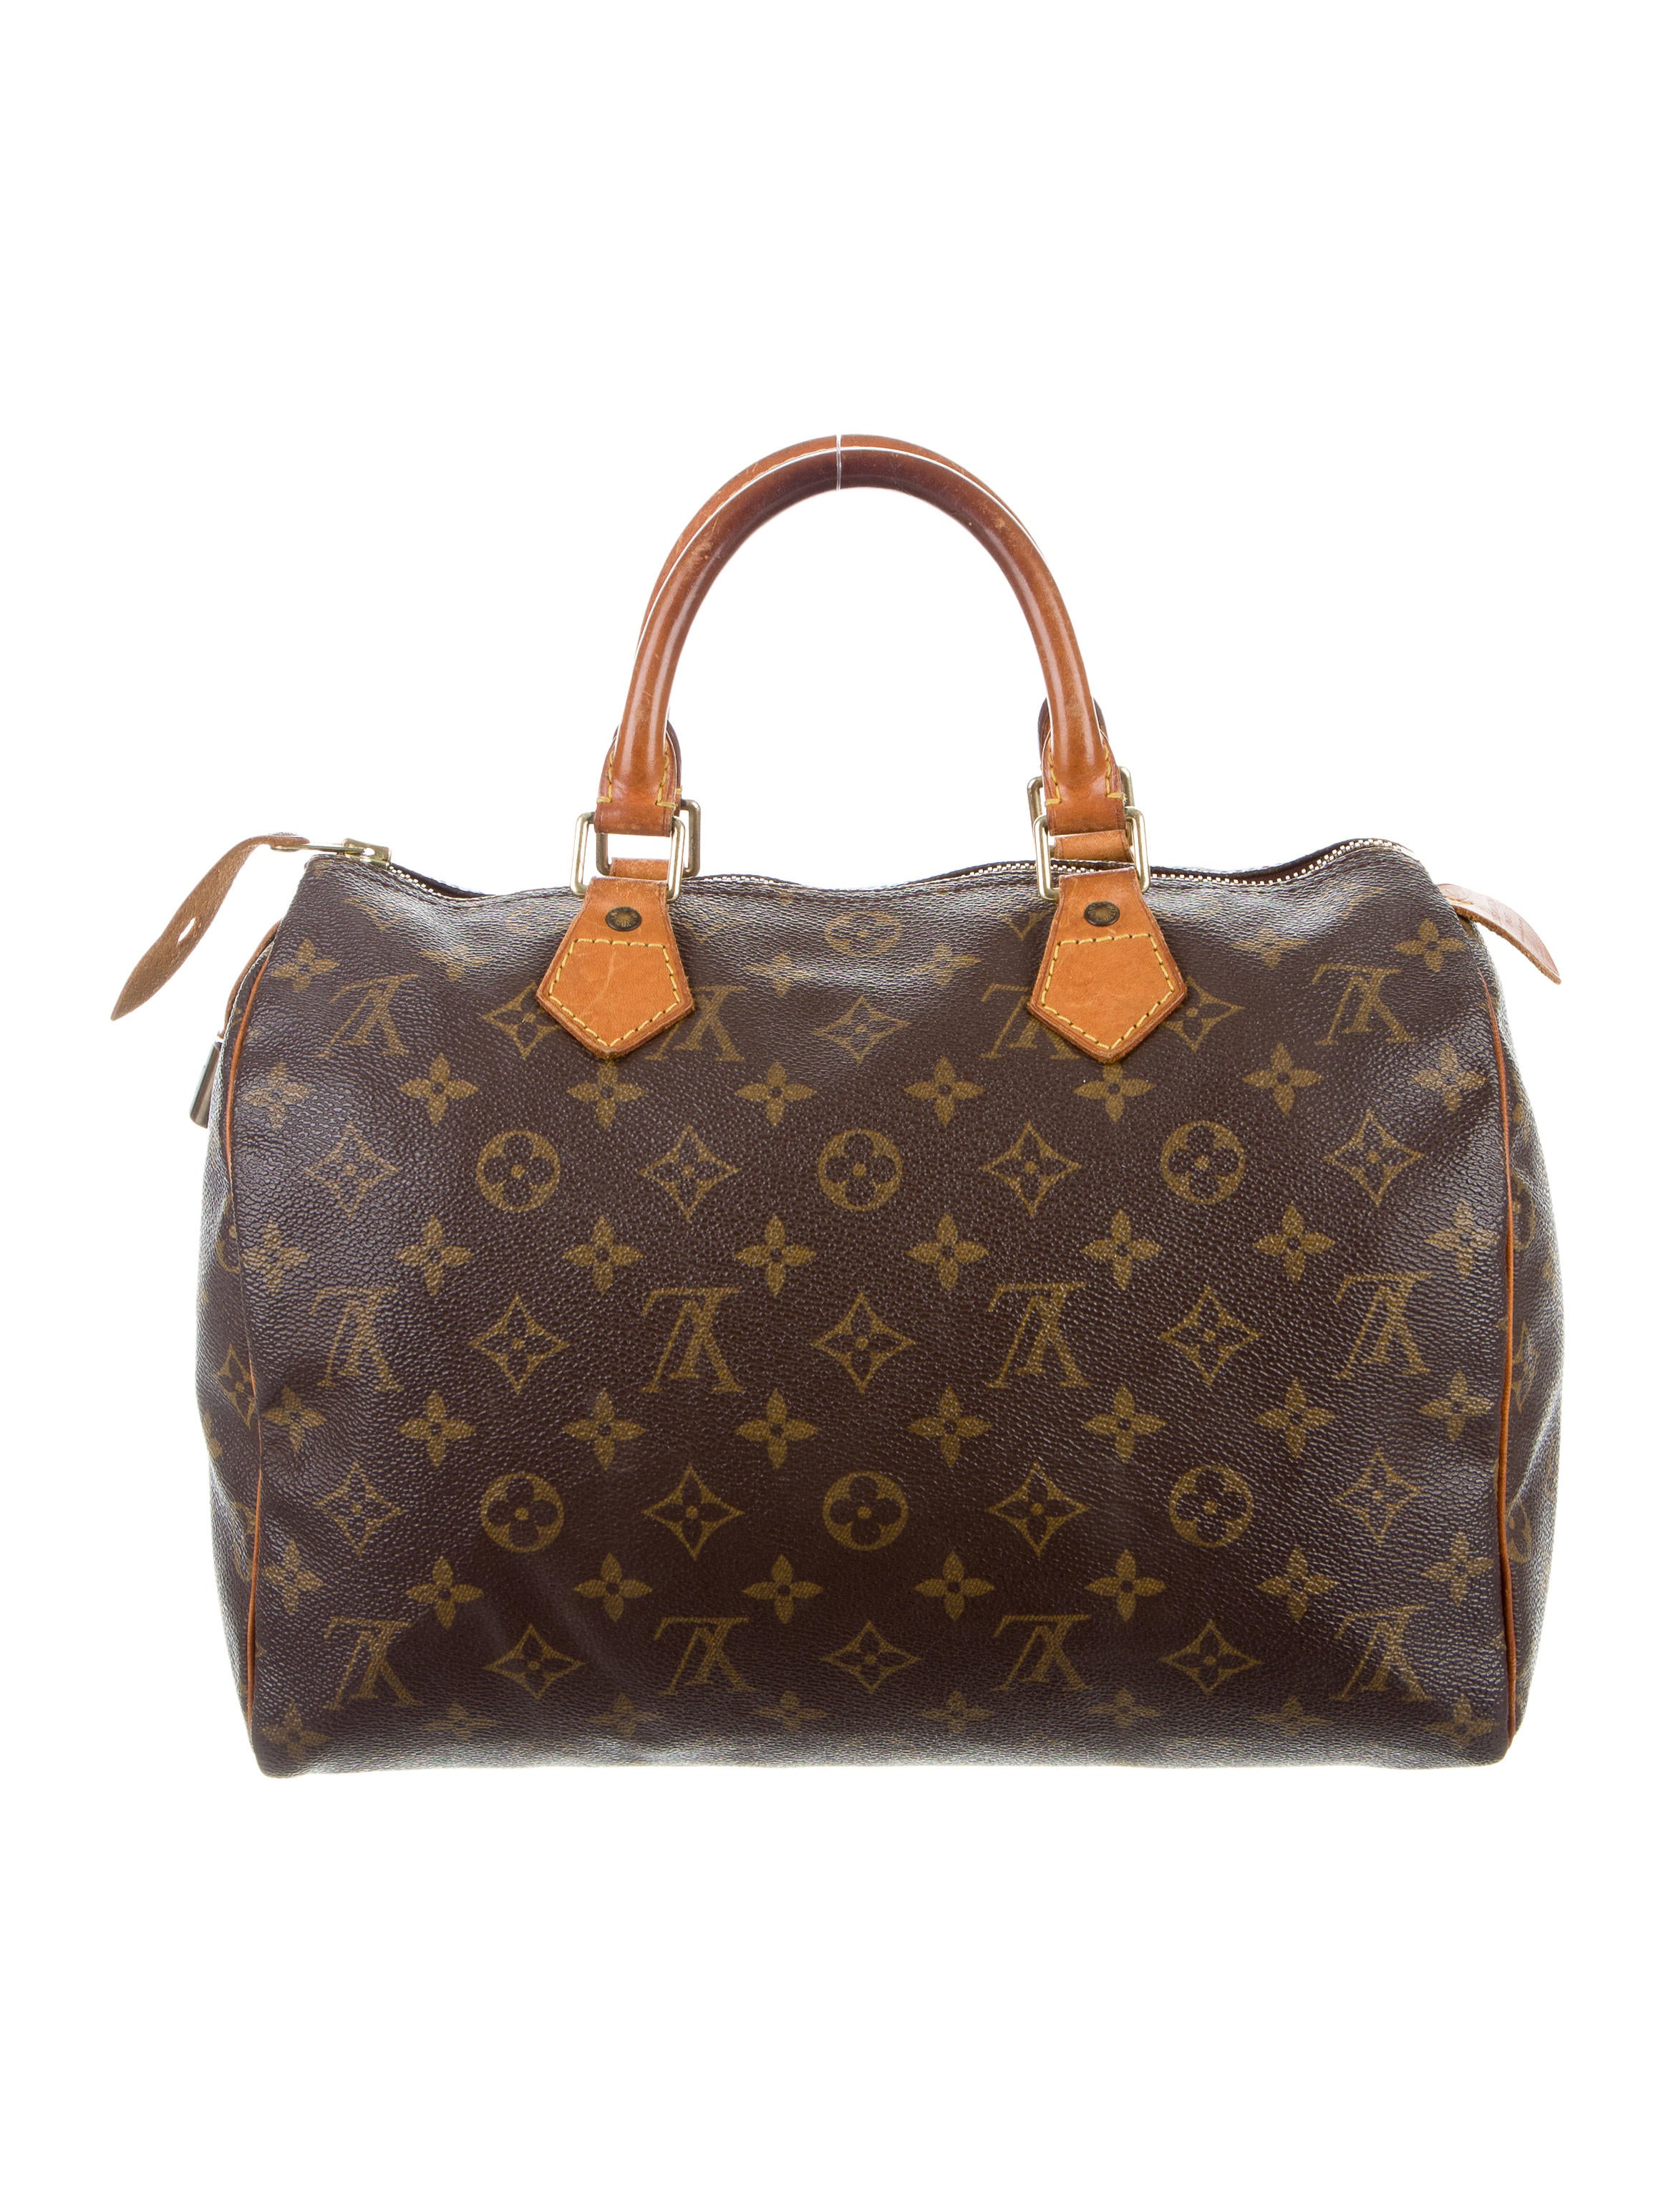 Louis vuitton monogram speedy 30 handbags lou110246 for Louis vuitton miroir speedy 30